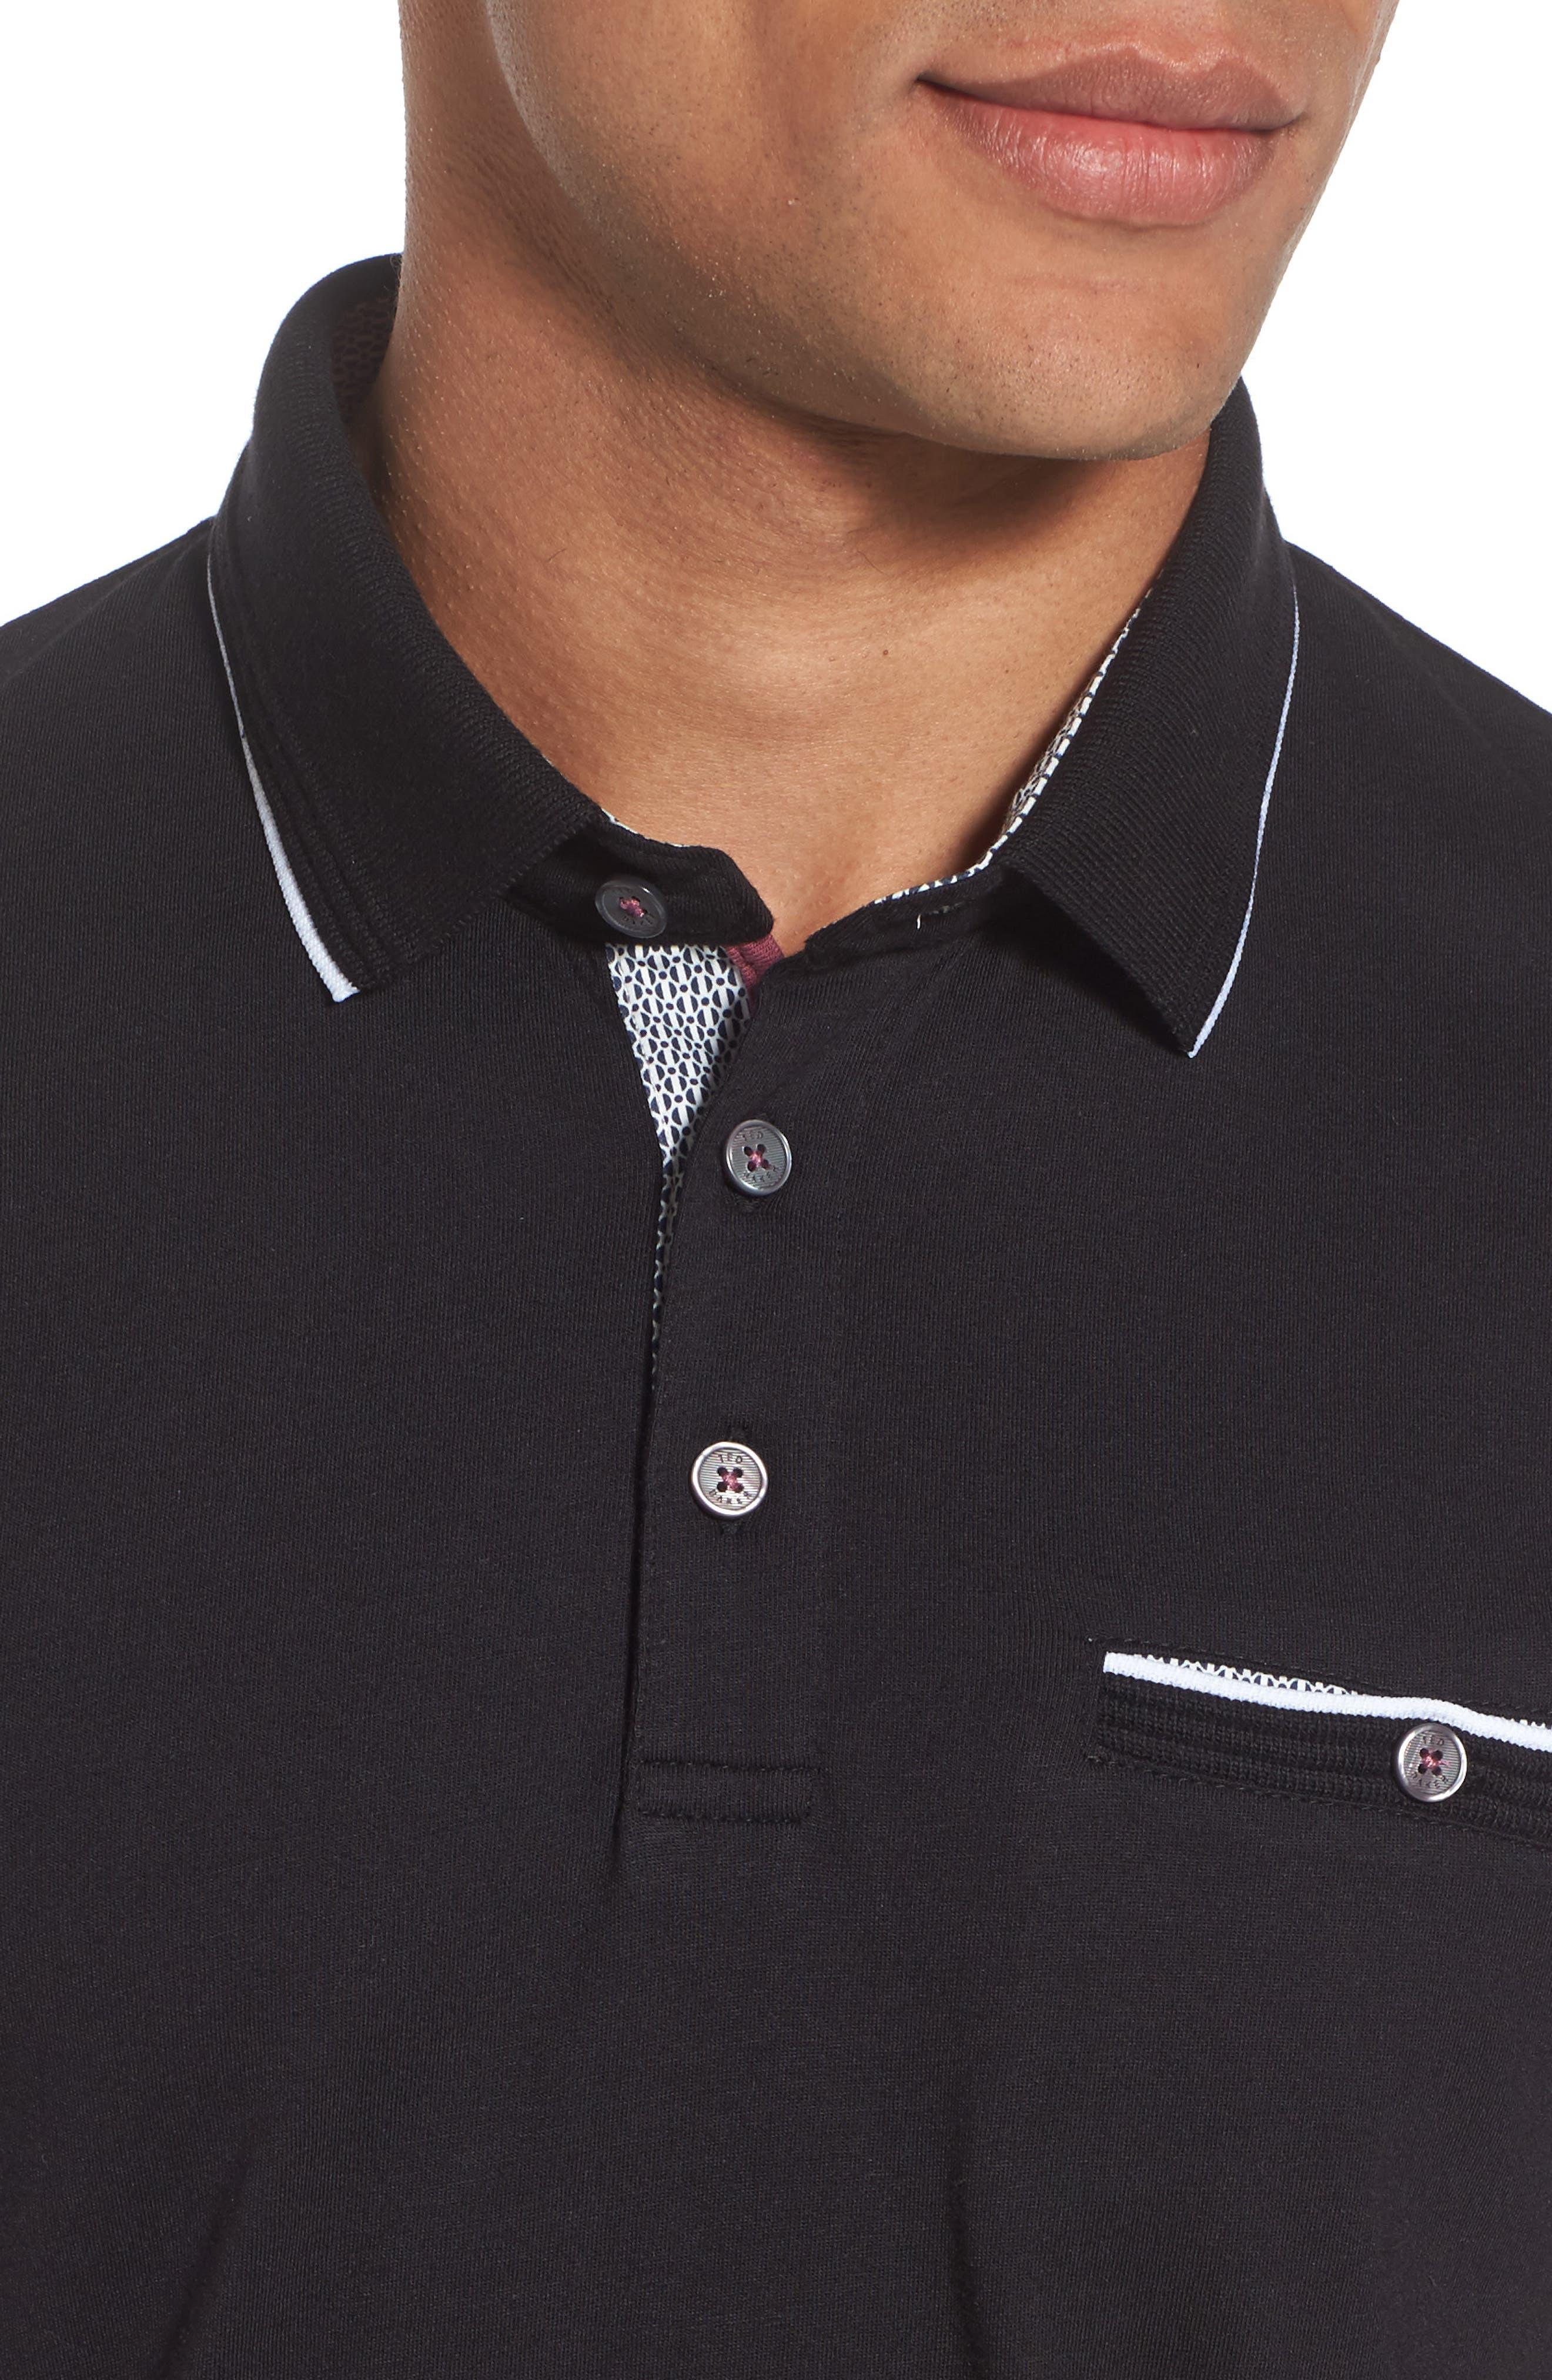 Derrytt Jersey Polo,                             Alternate thumbnail 4, color,                             001